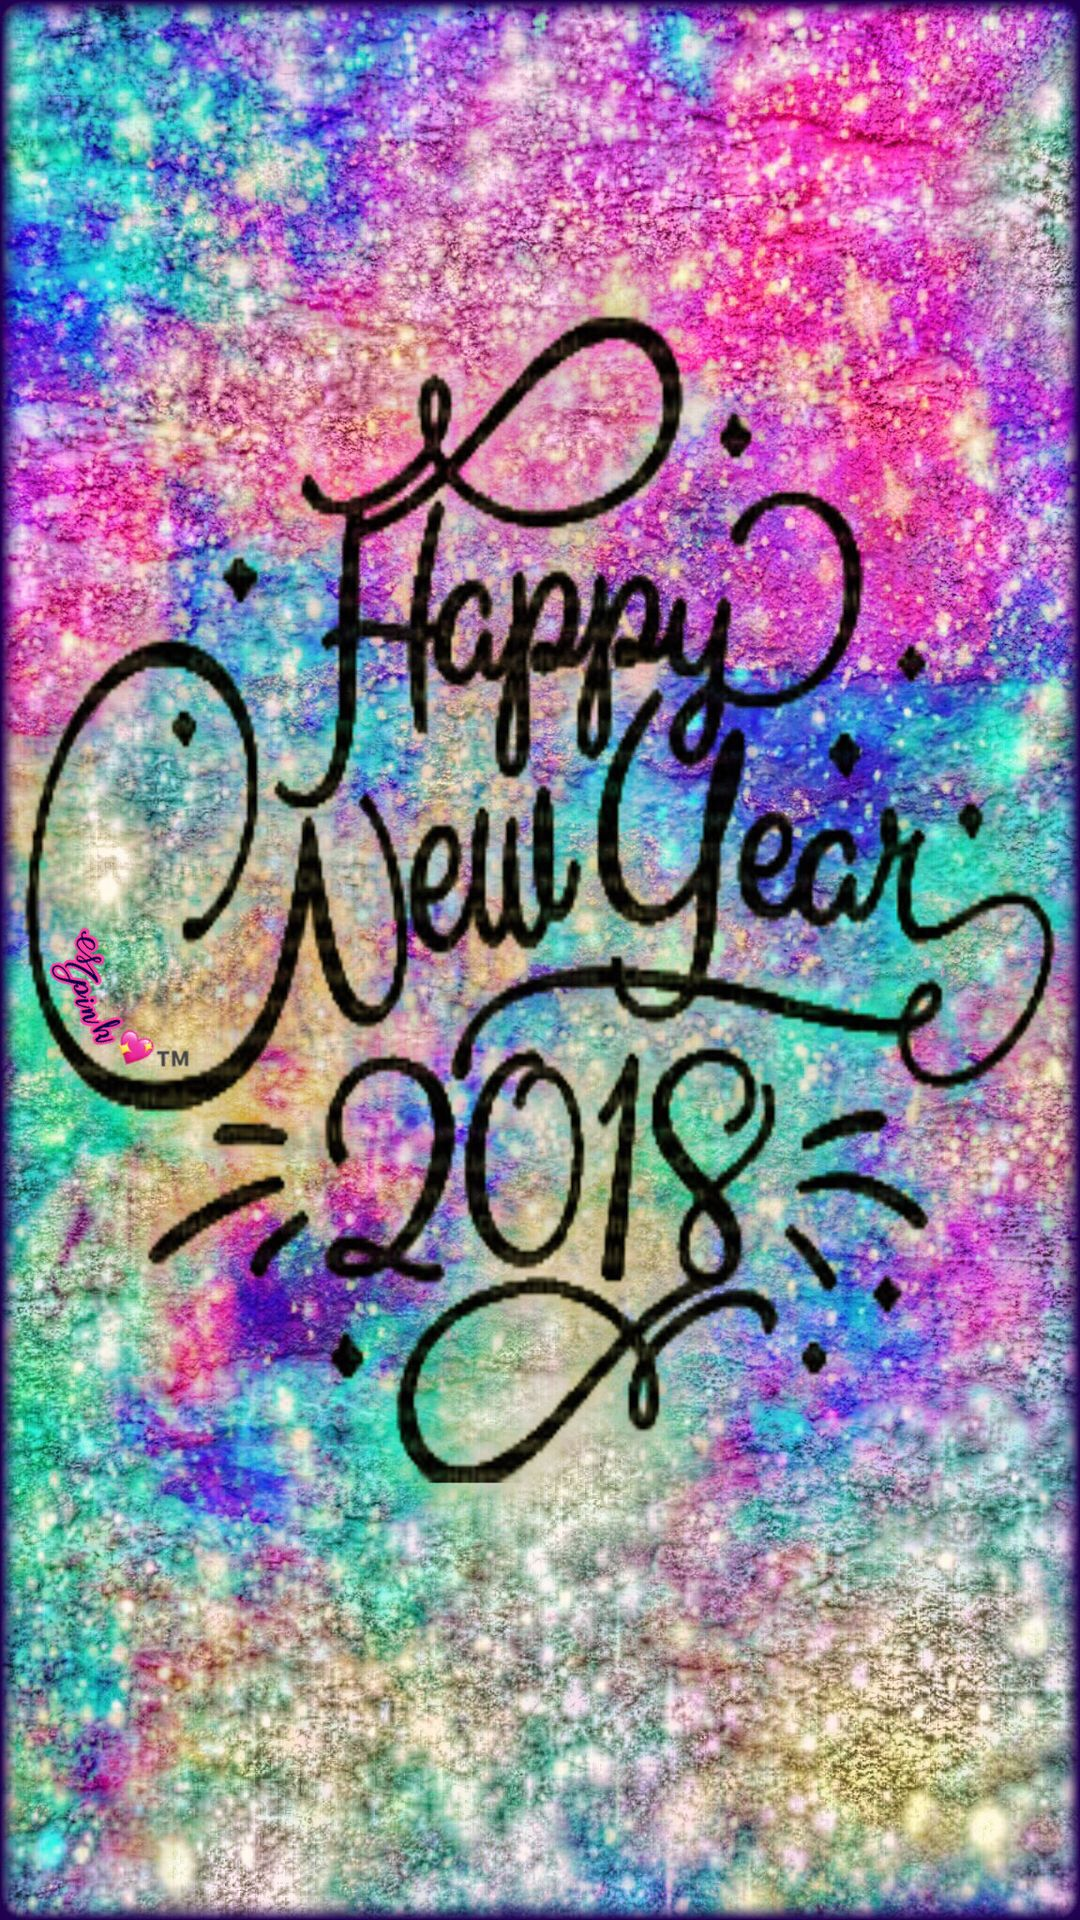 Happy New Year Galaxy Wallpaper Androidwallpaper Iphonewallpaper Wallpaper Galaxy Sparkle Glitter Lo Galaxy Wallpaper Iphone Wallpaper Android Wallpaper